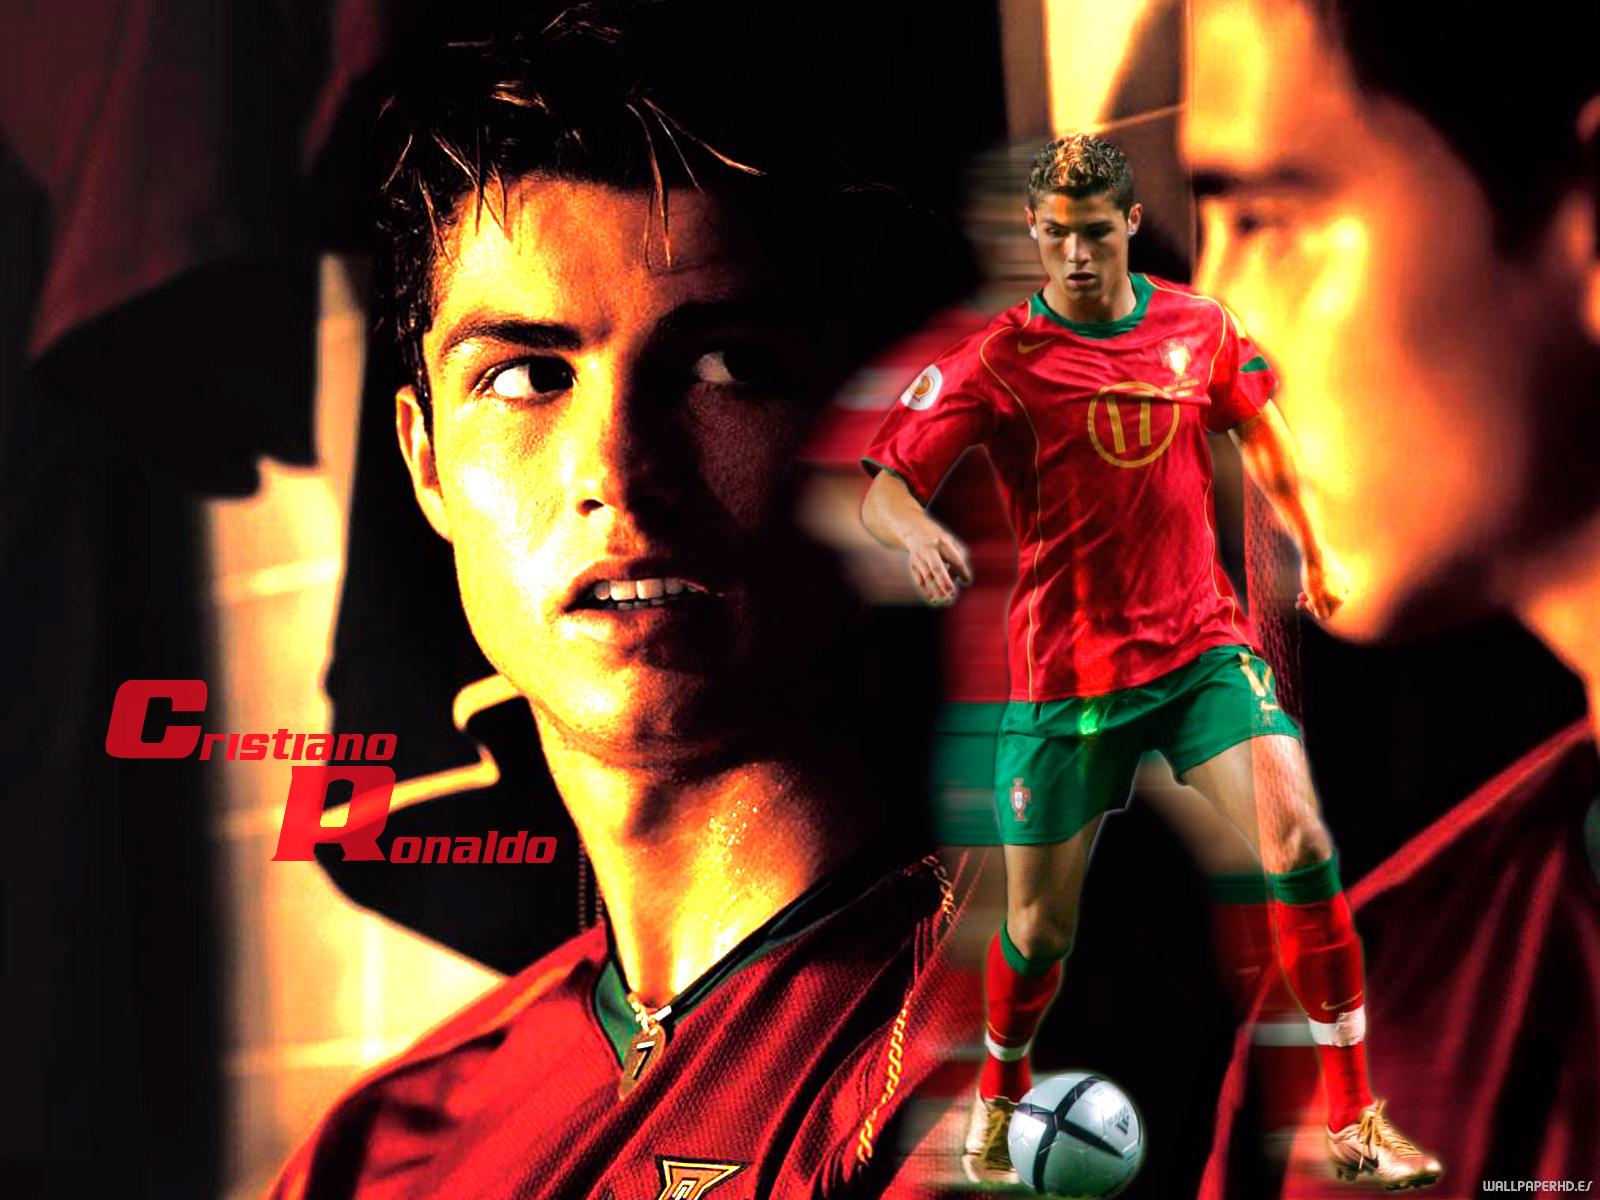 wallpaper de Cristiano ronaldo con camiseta de portugal